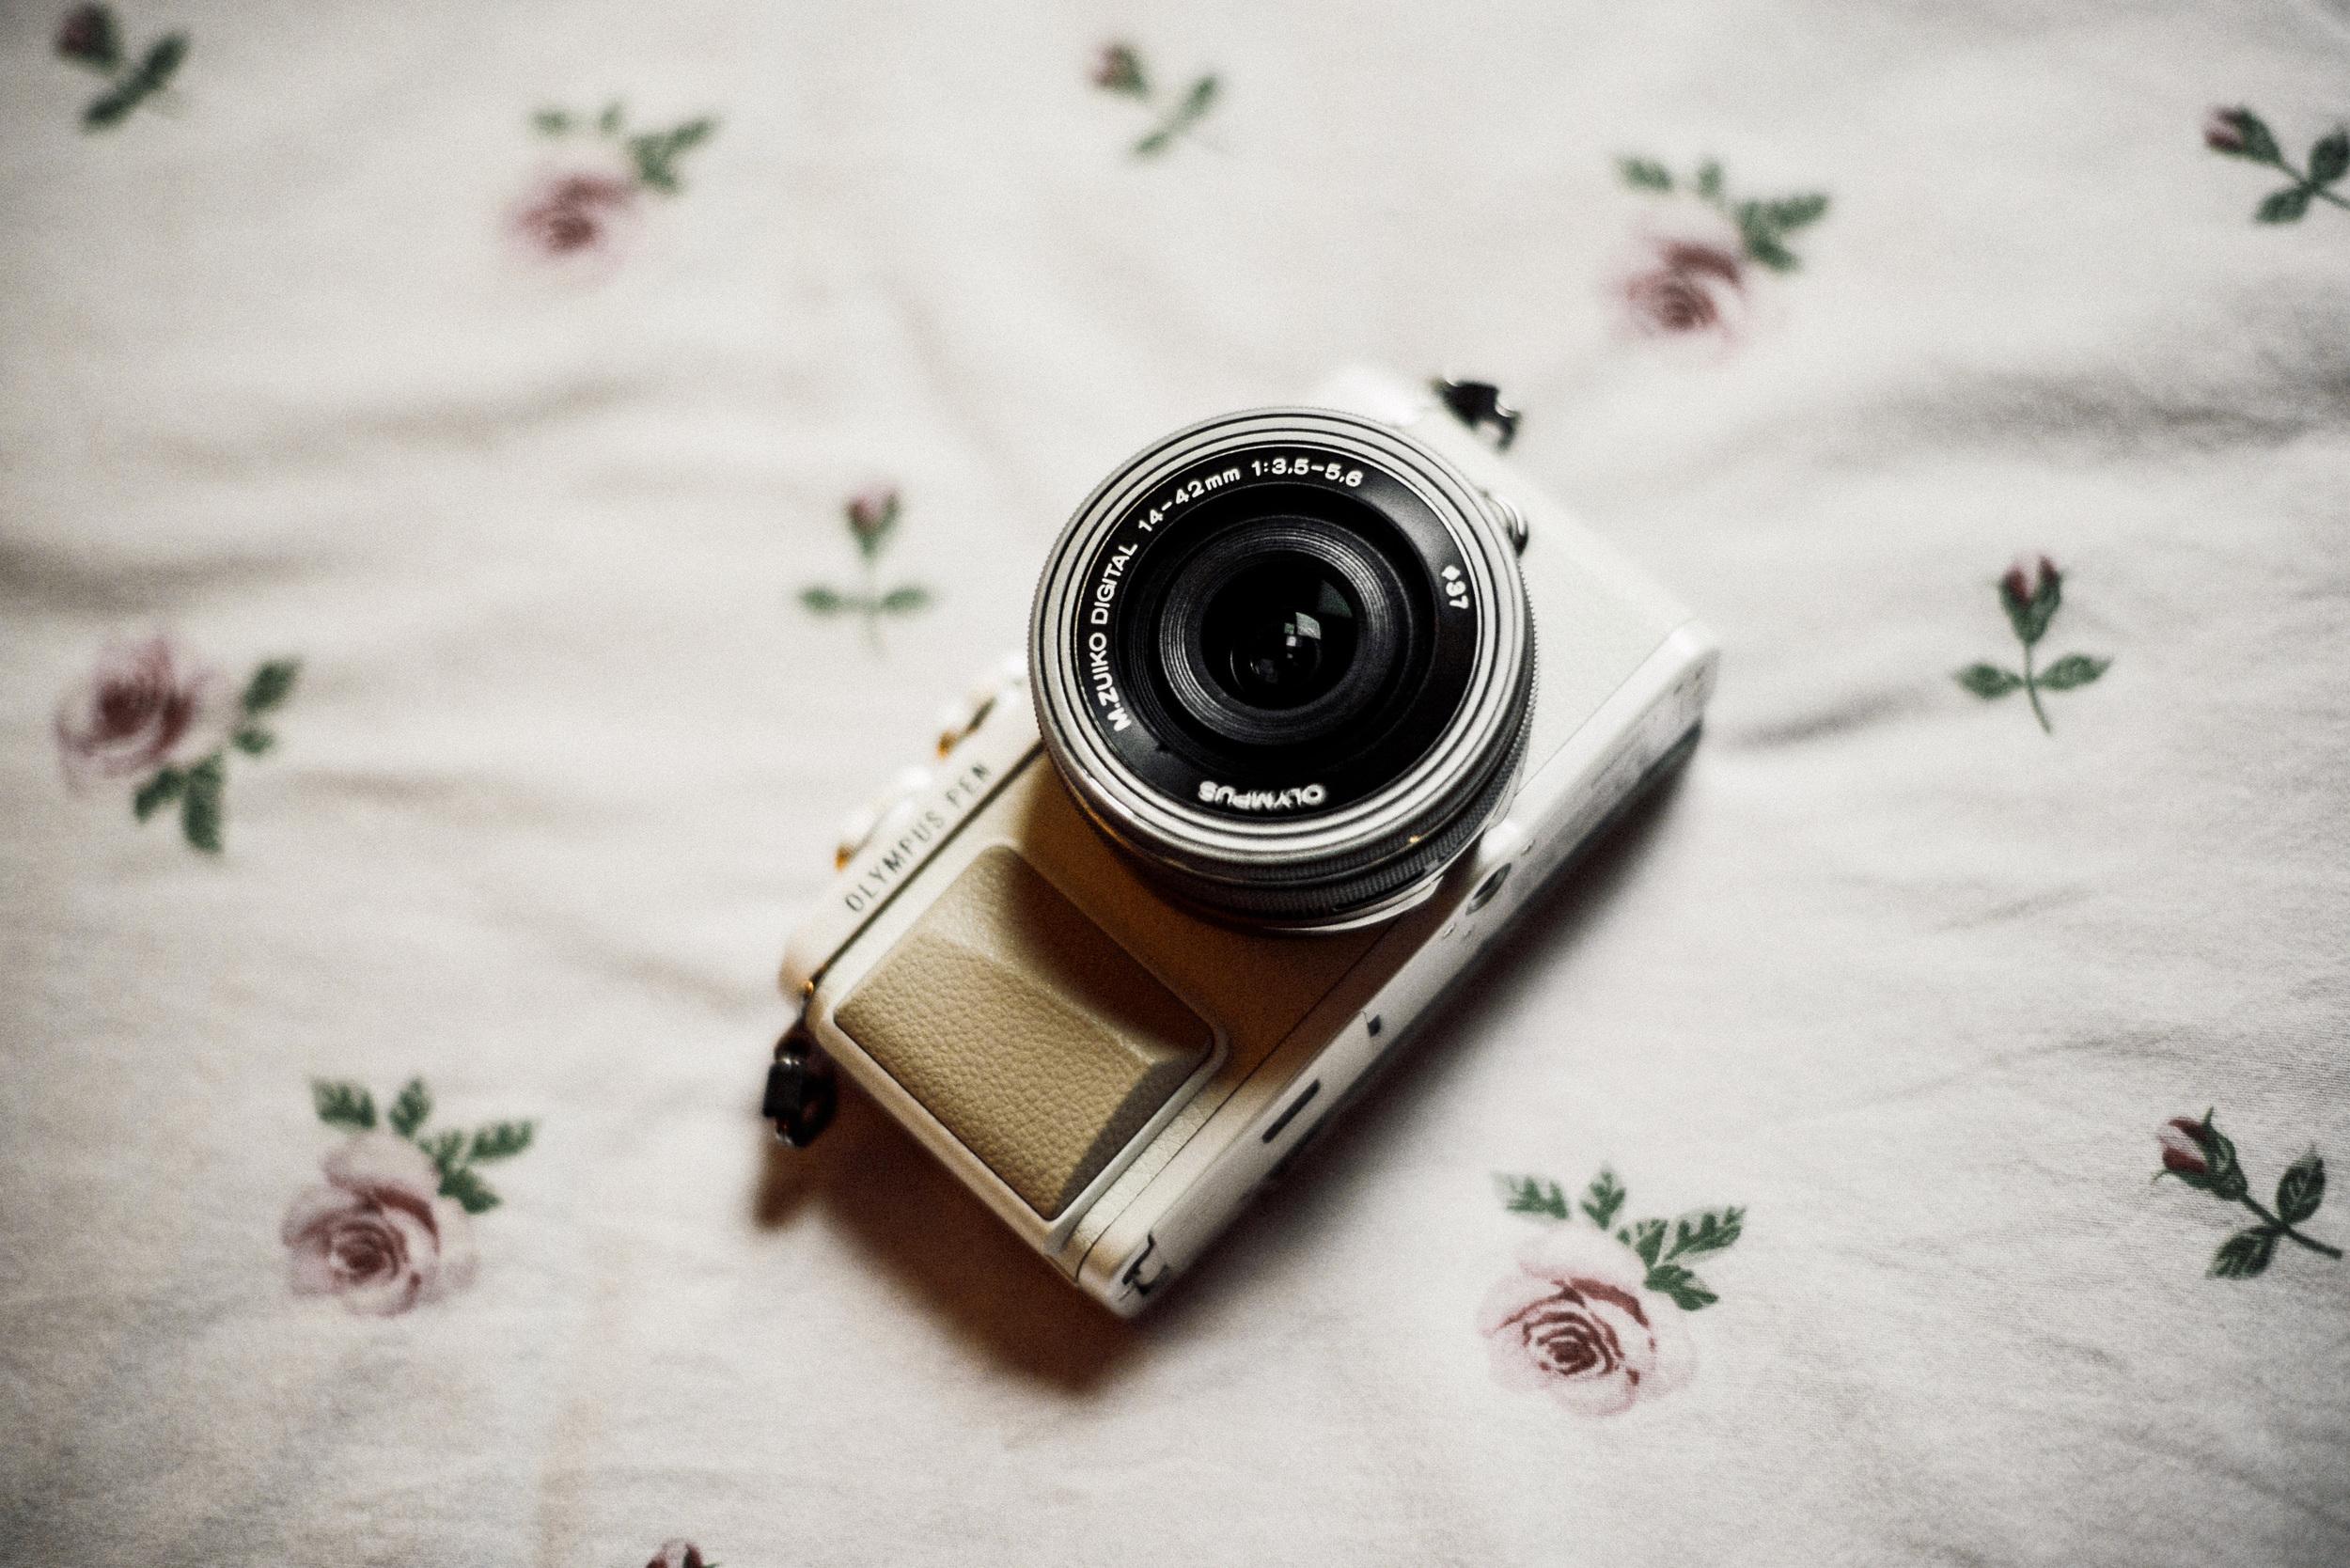 olympus pen generation EPL-7 camera fasion blogger review